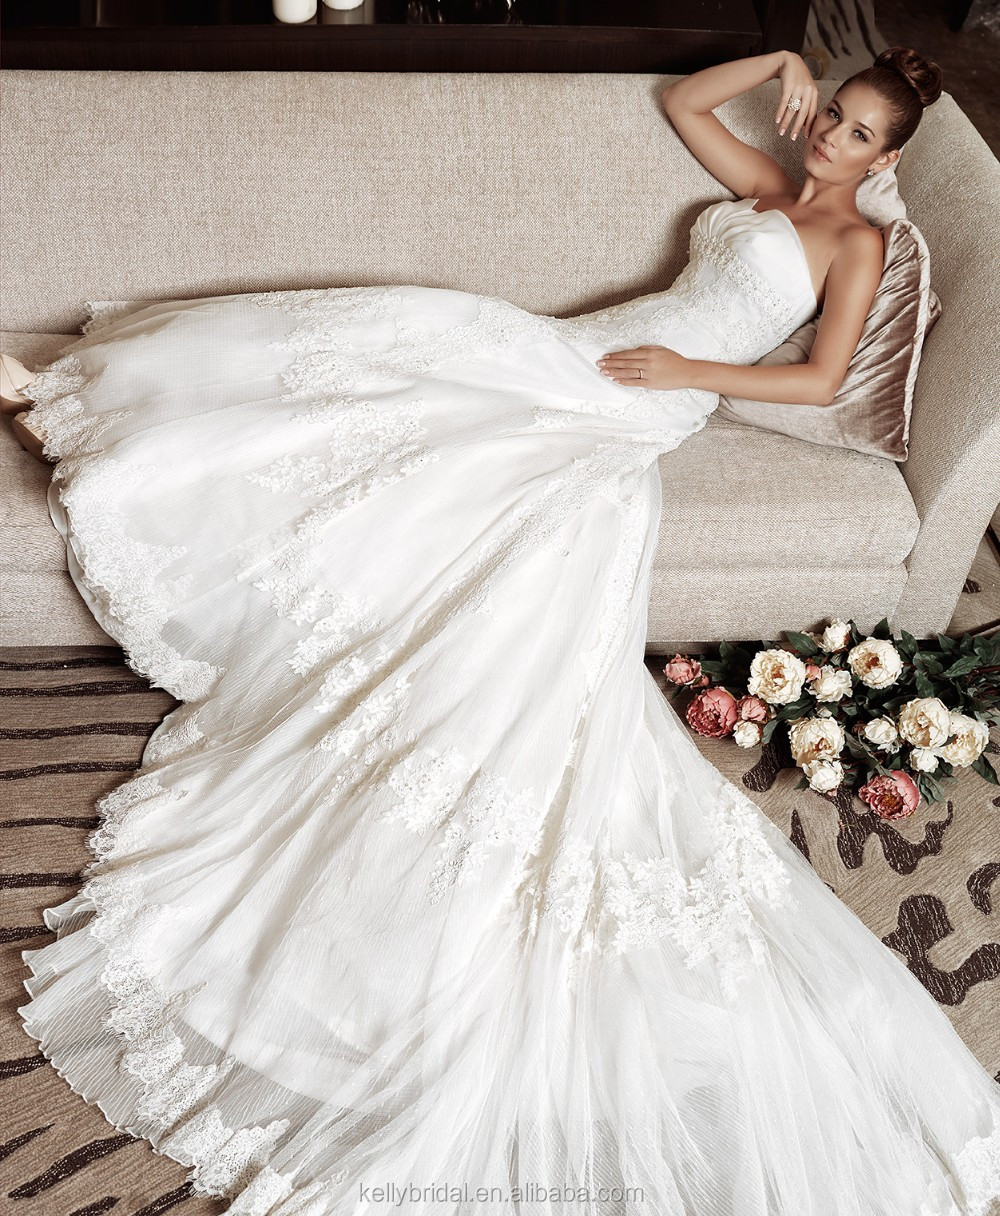 Zm16030 Detachable Big Long Train Gown Vintage Sweetheart White